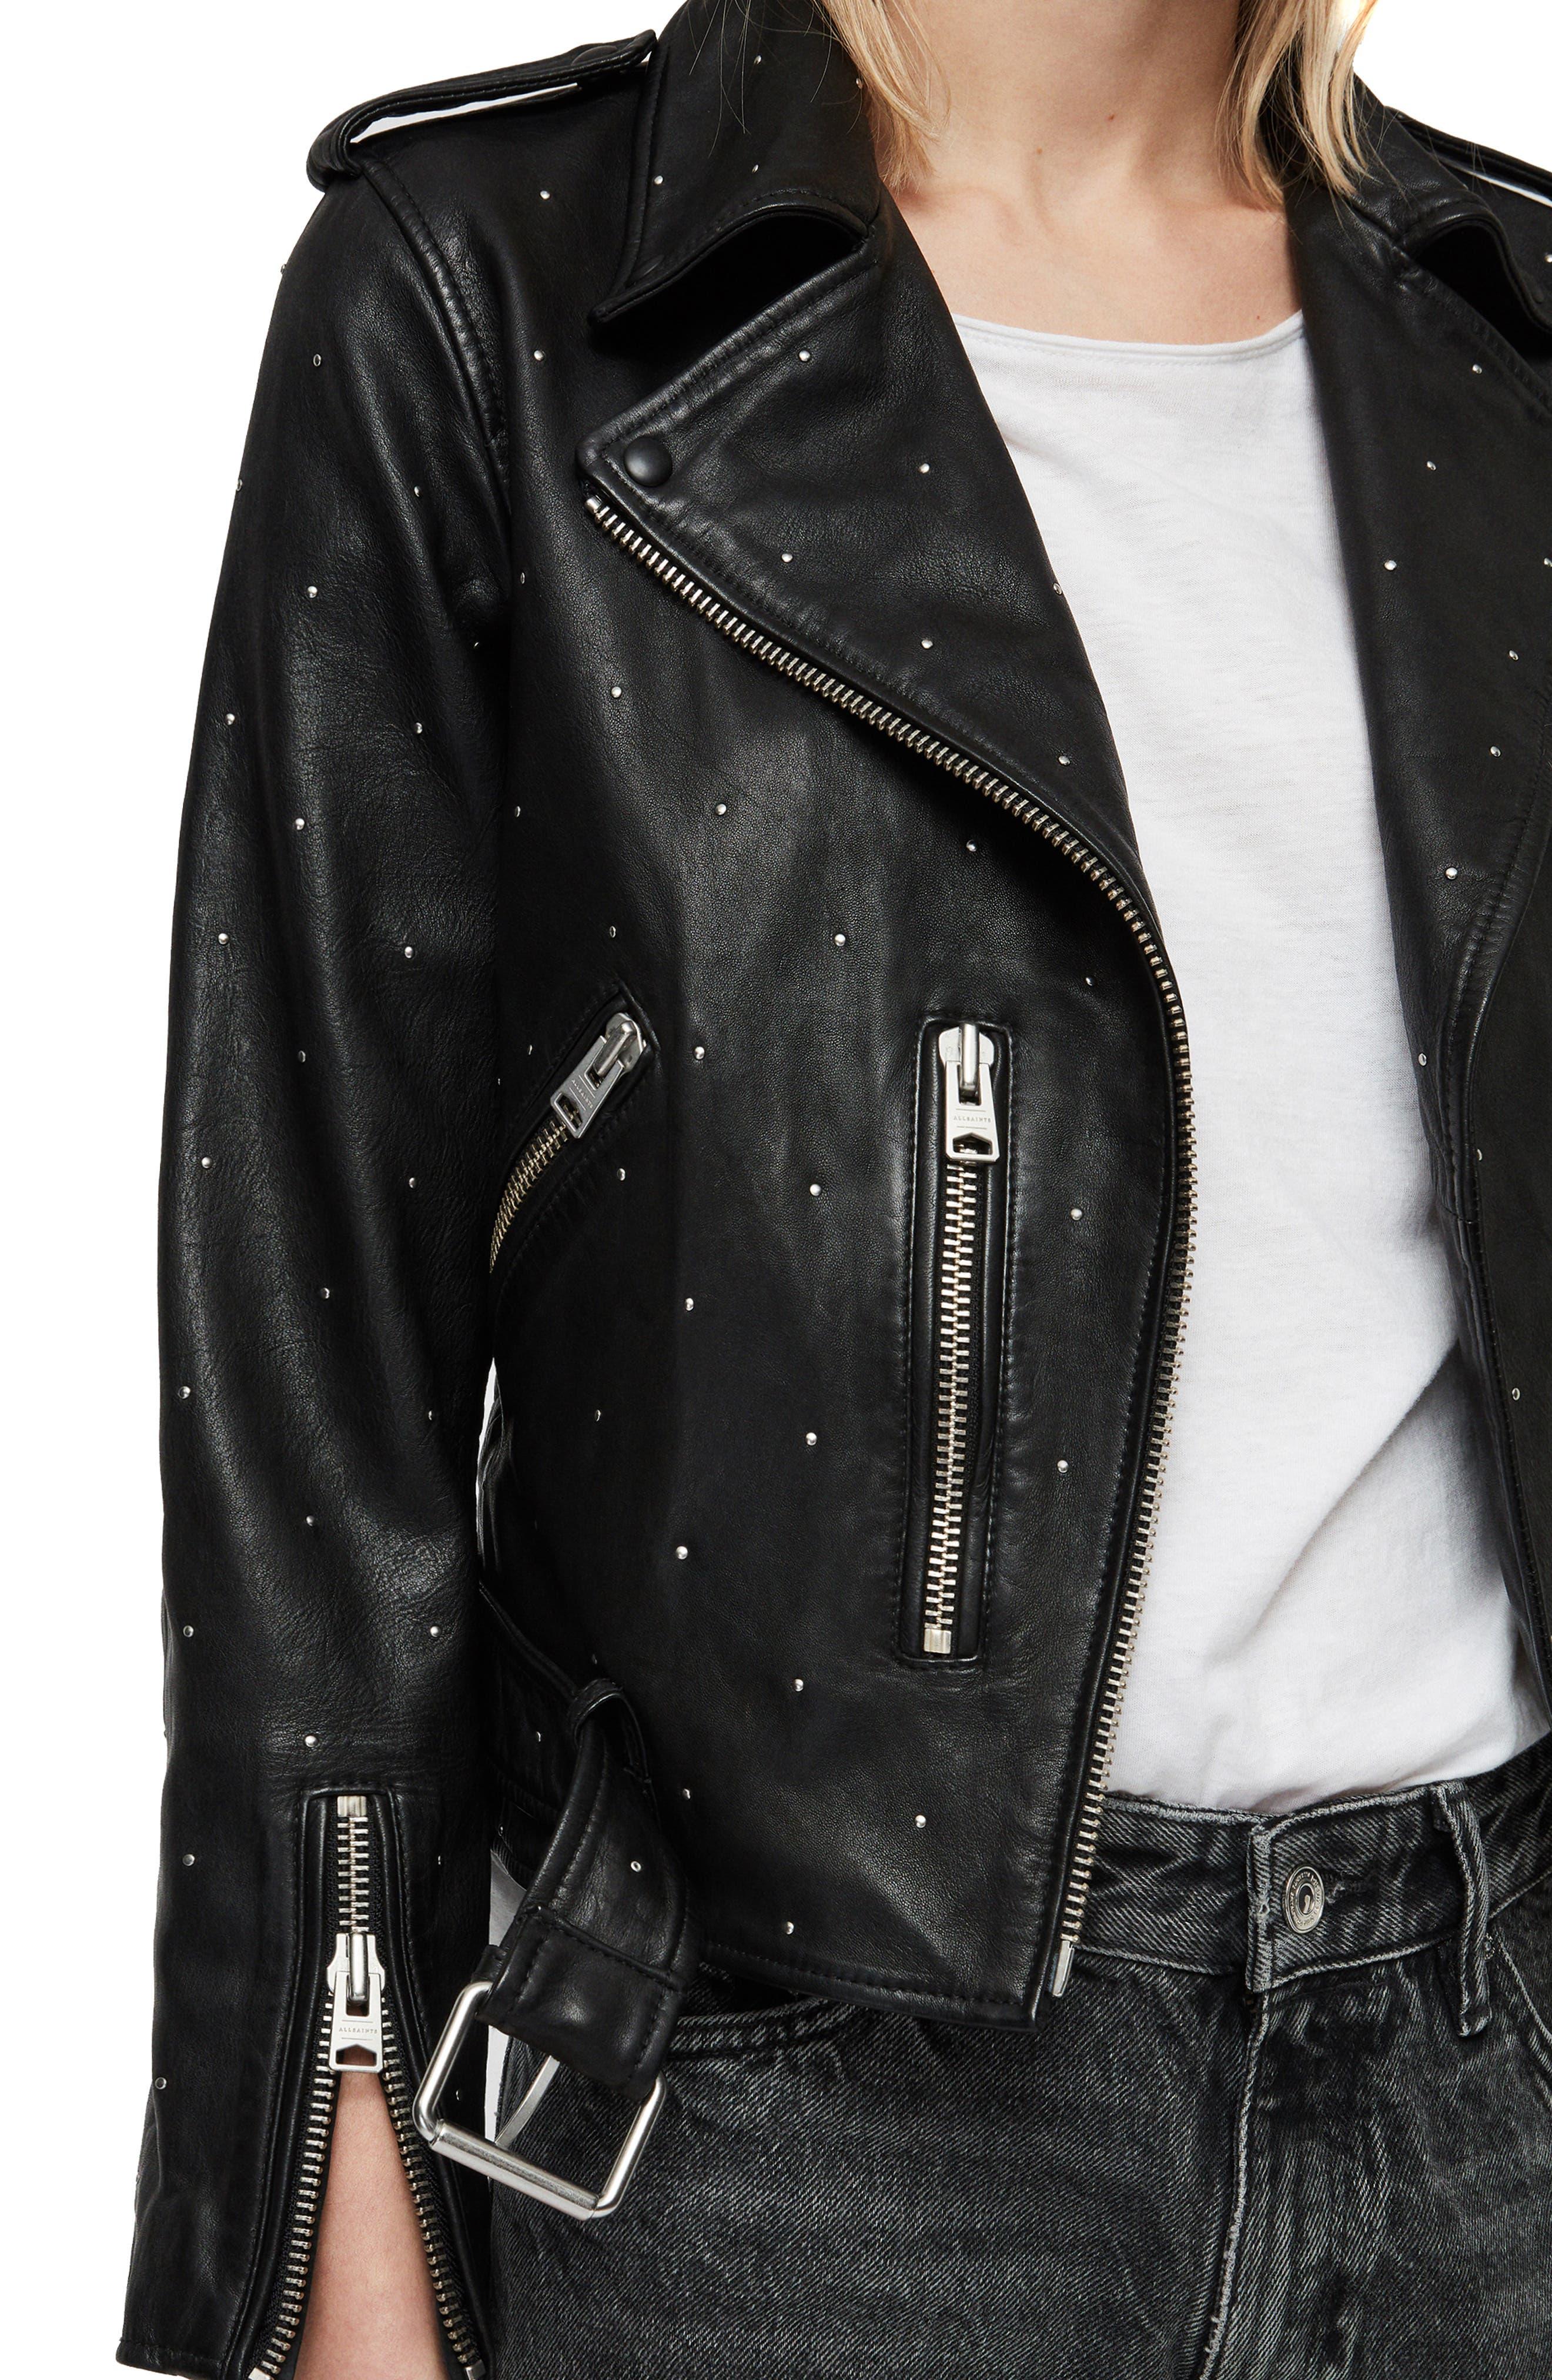 Balfern Studded Leather Biker Jacket,                             Alternate thumbnail 4, color,                             BLACK